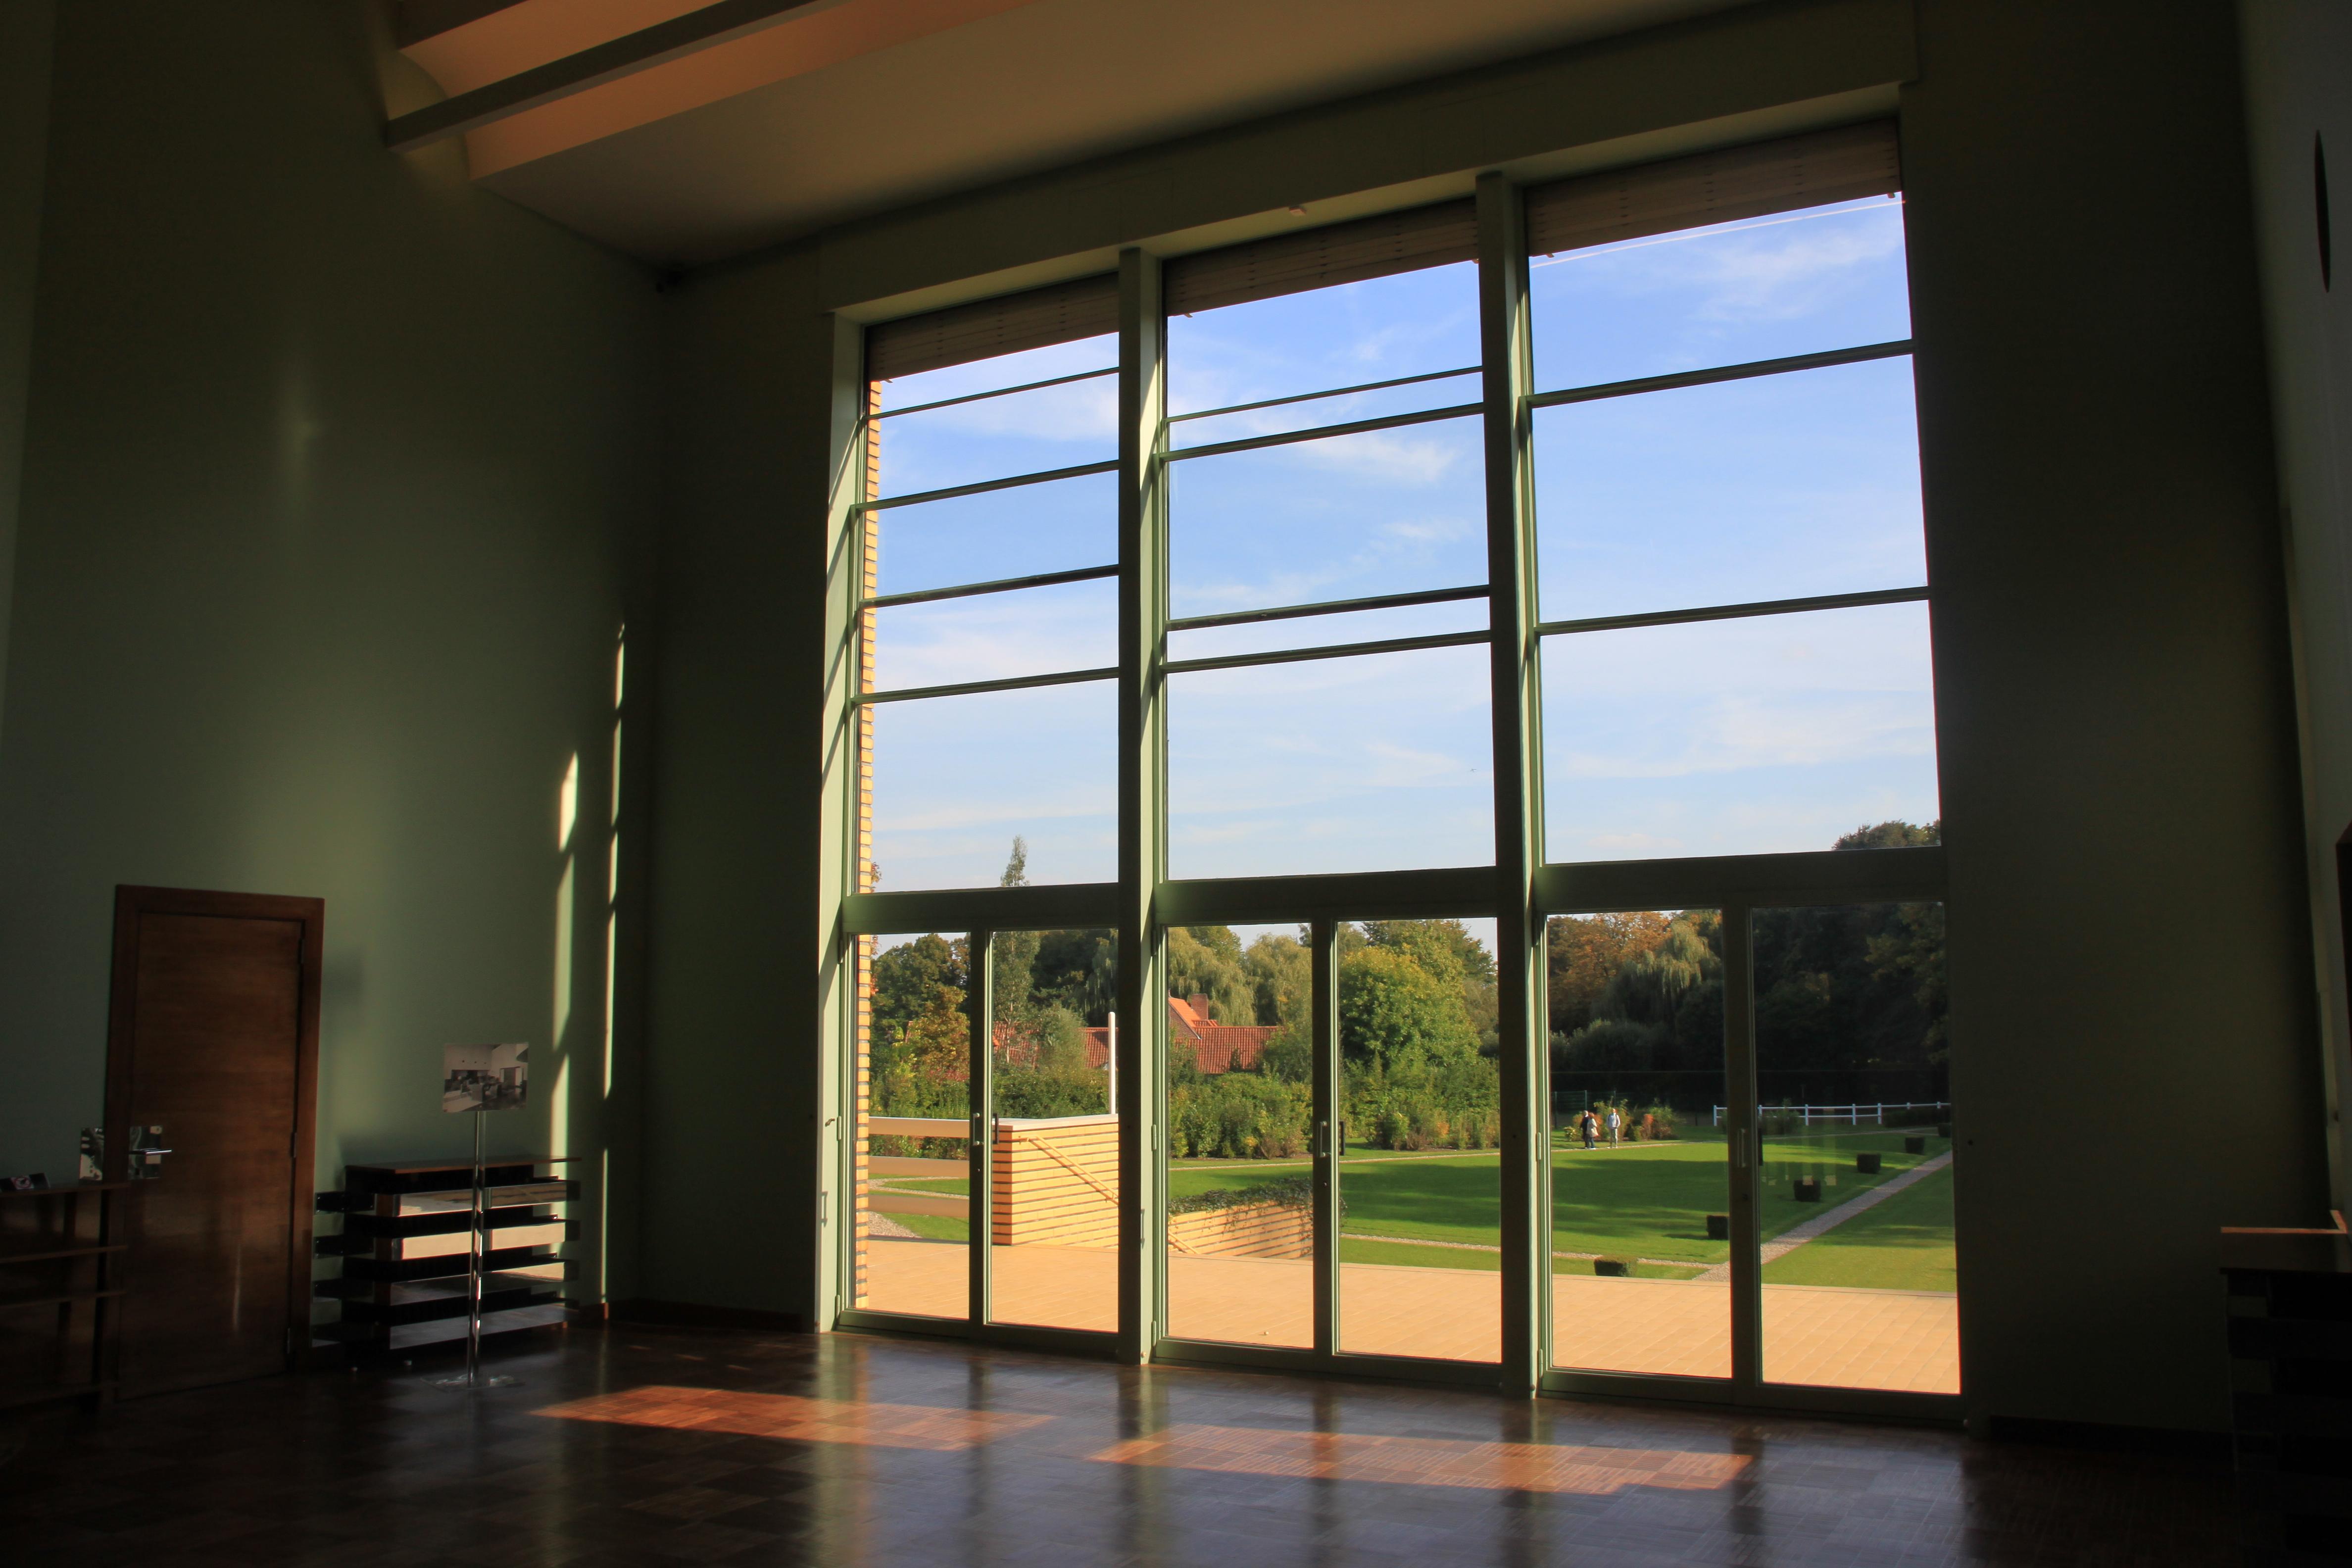 villa cavrois croix sorties culturelles lille. Black Bedroom Furniture Sets. Home Design Ideas